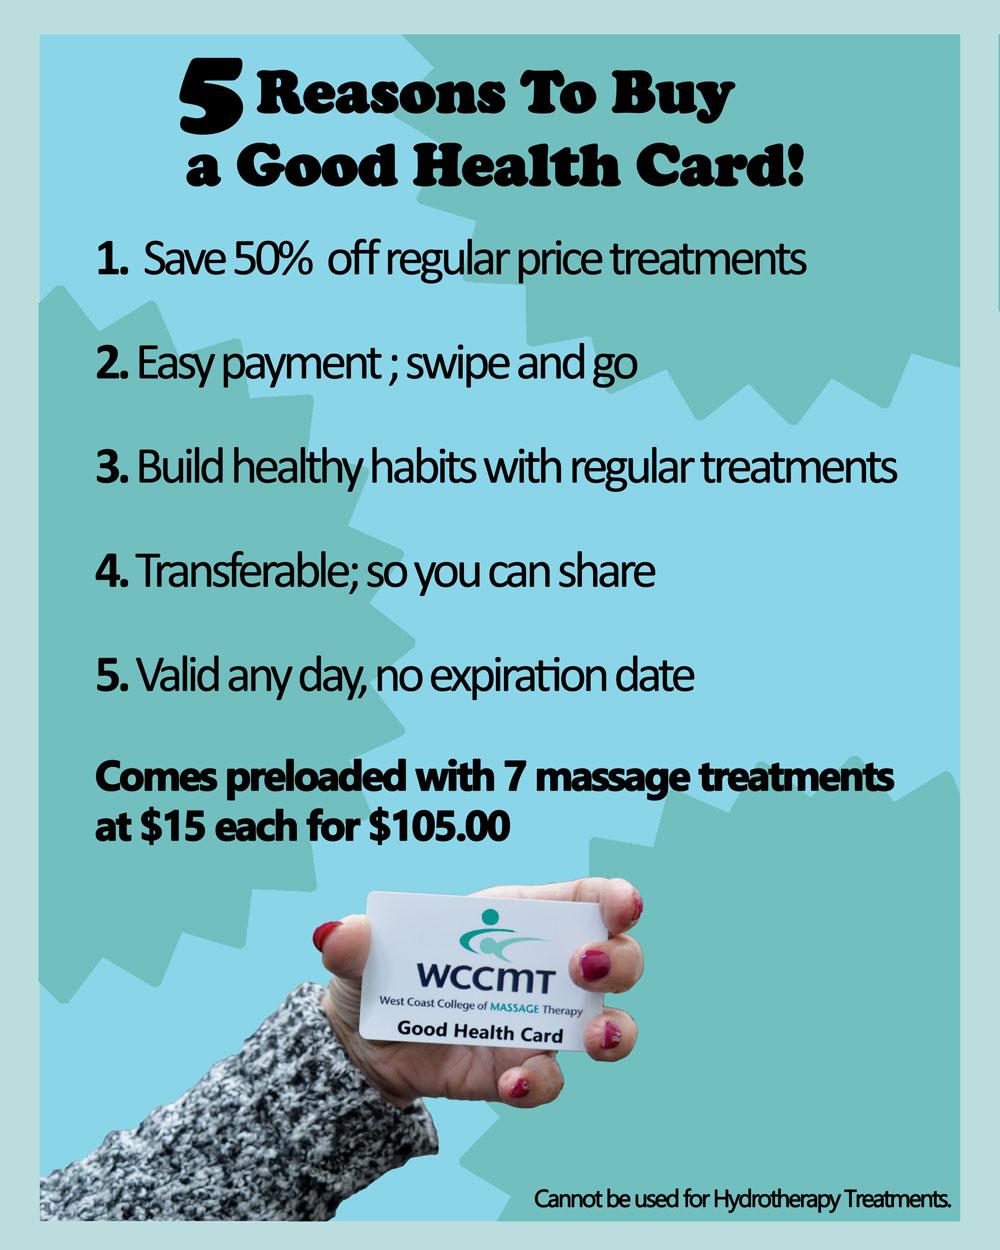 Good Buy: 5 Reasons To Buy A Good Health Card